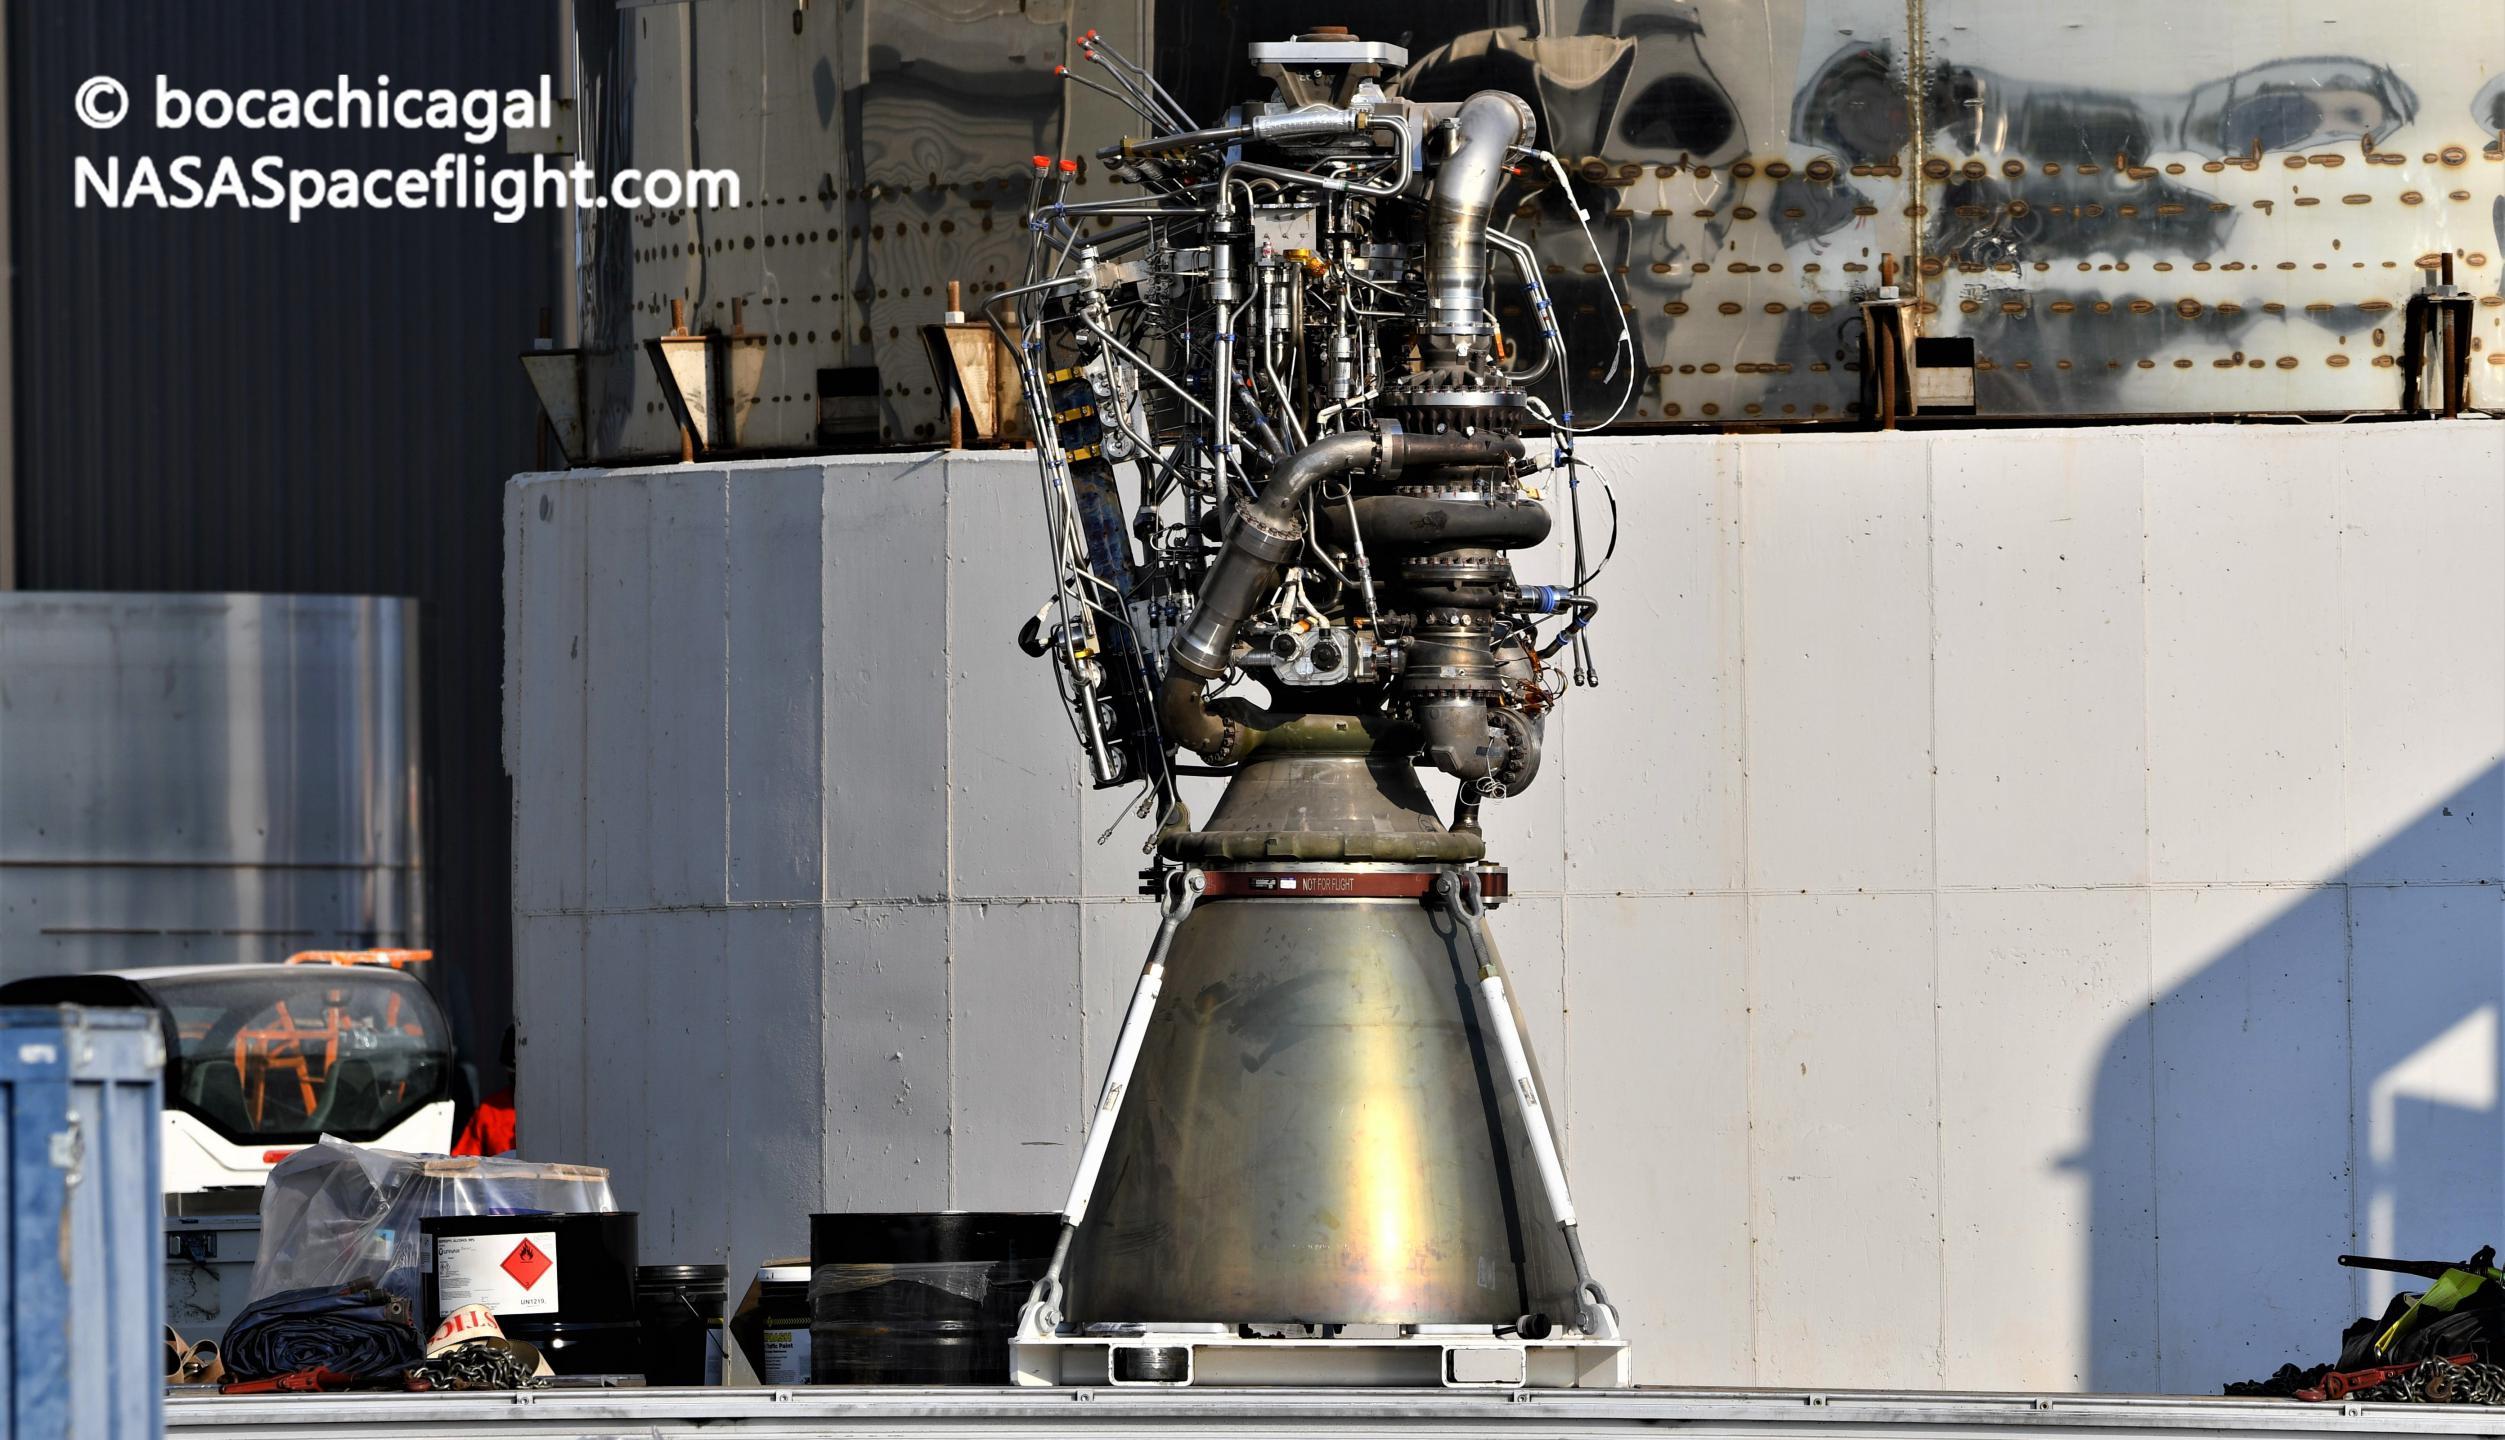 Starship Boca Chica 100220 (NASASpaceflight – bocachicagal) Raptor SN29 1 crop (c)